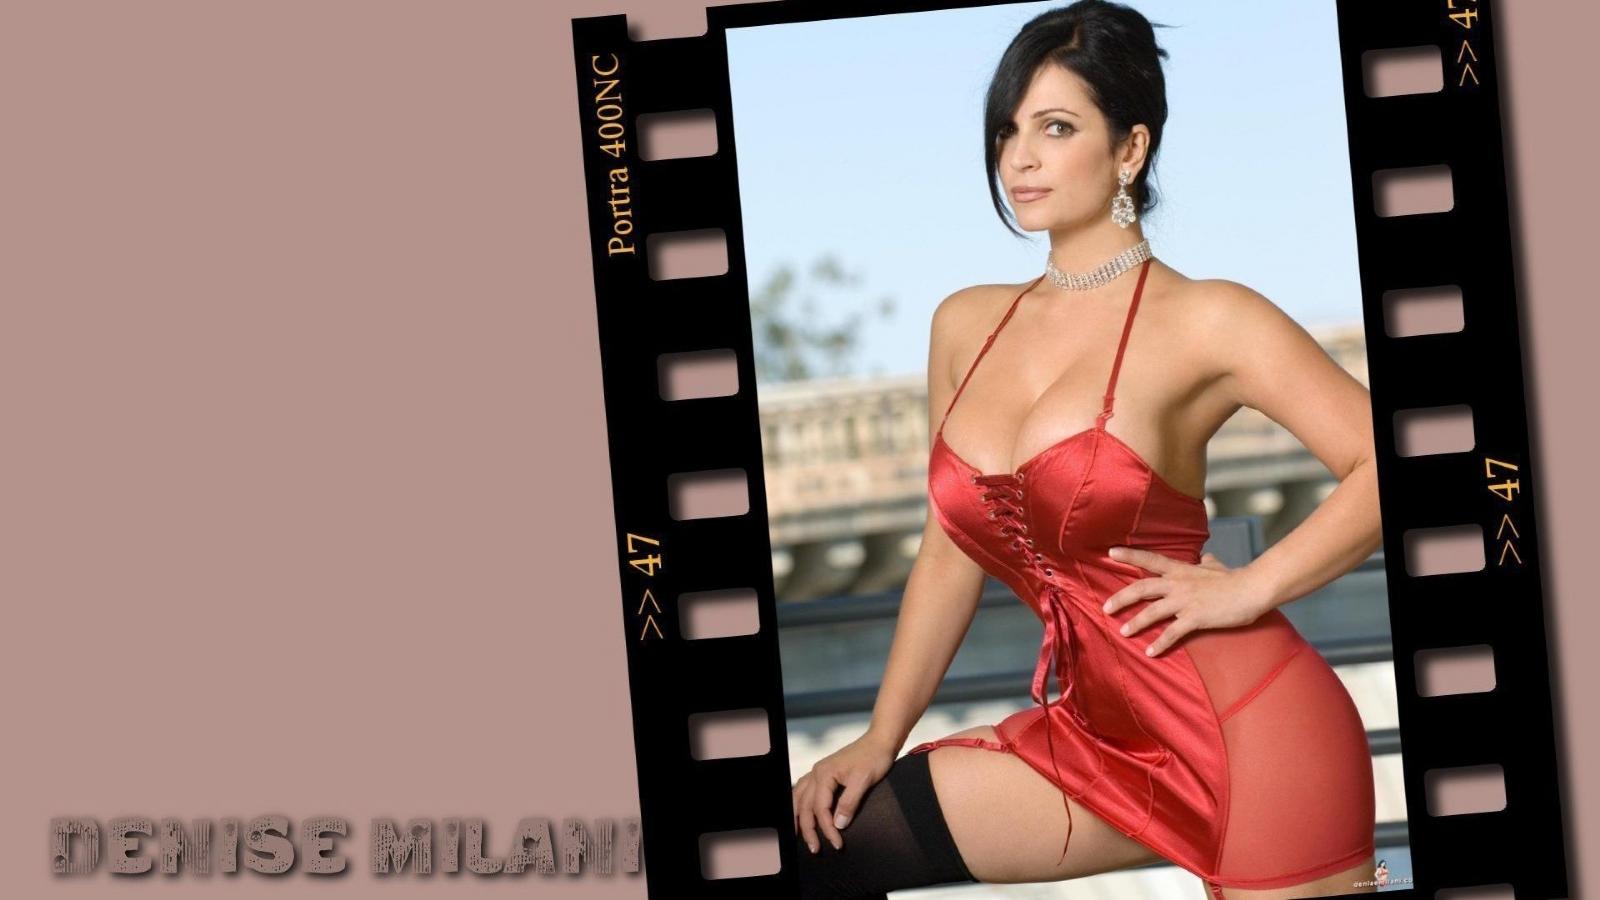 hot denise milani wallpapers hd entertainment pics